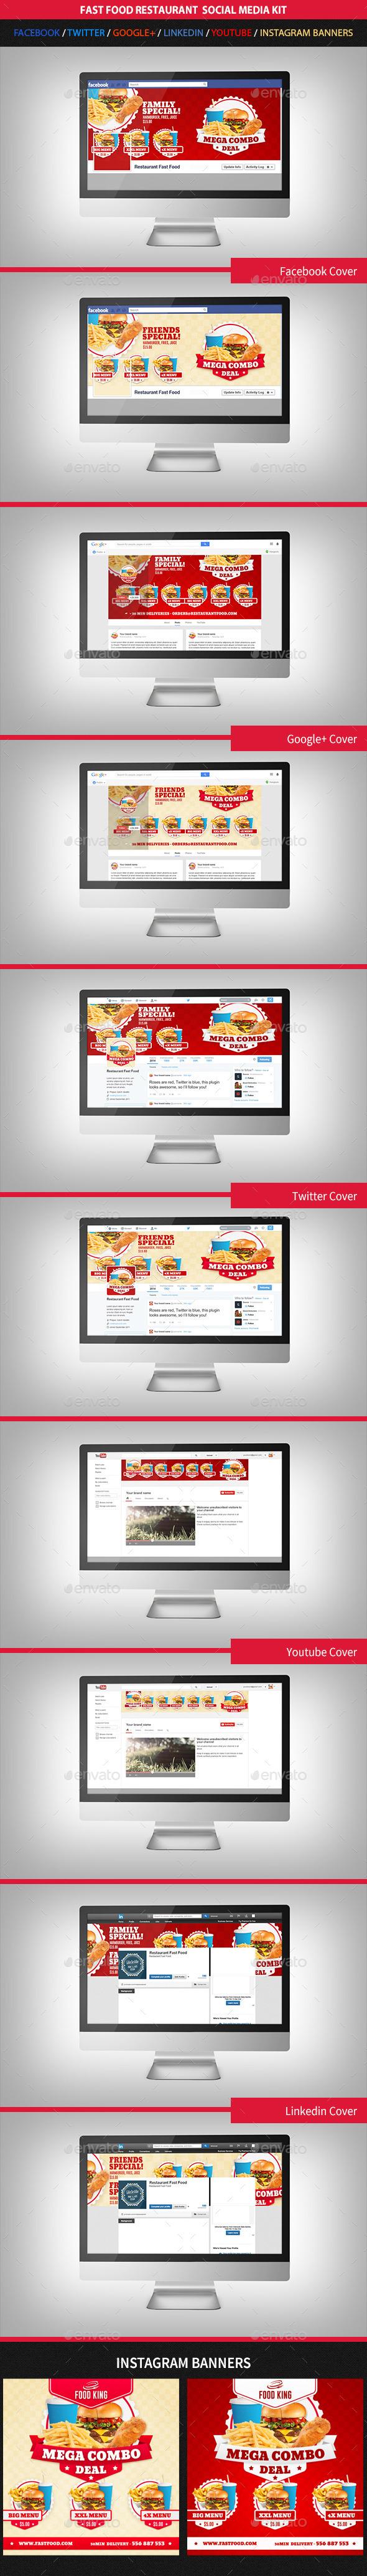 Restaurant Fast Food Web Social Media Kit  - Social Media Web Elements